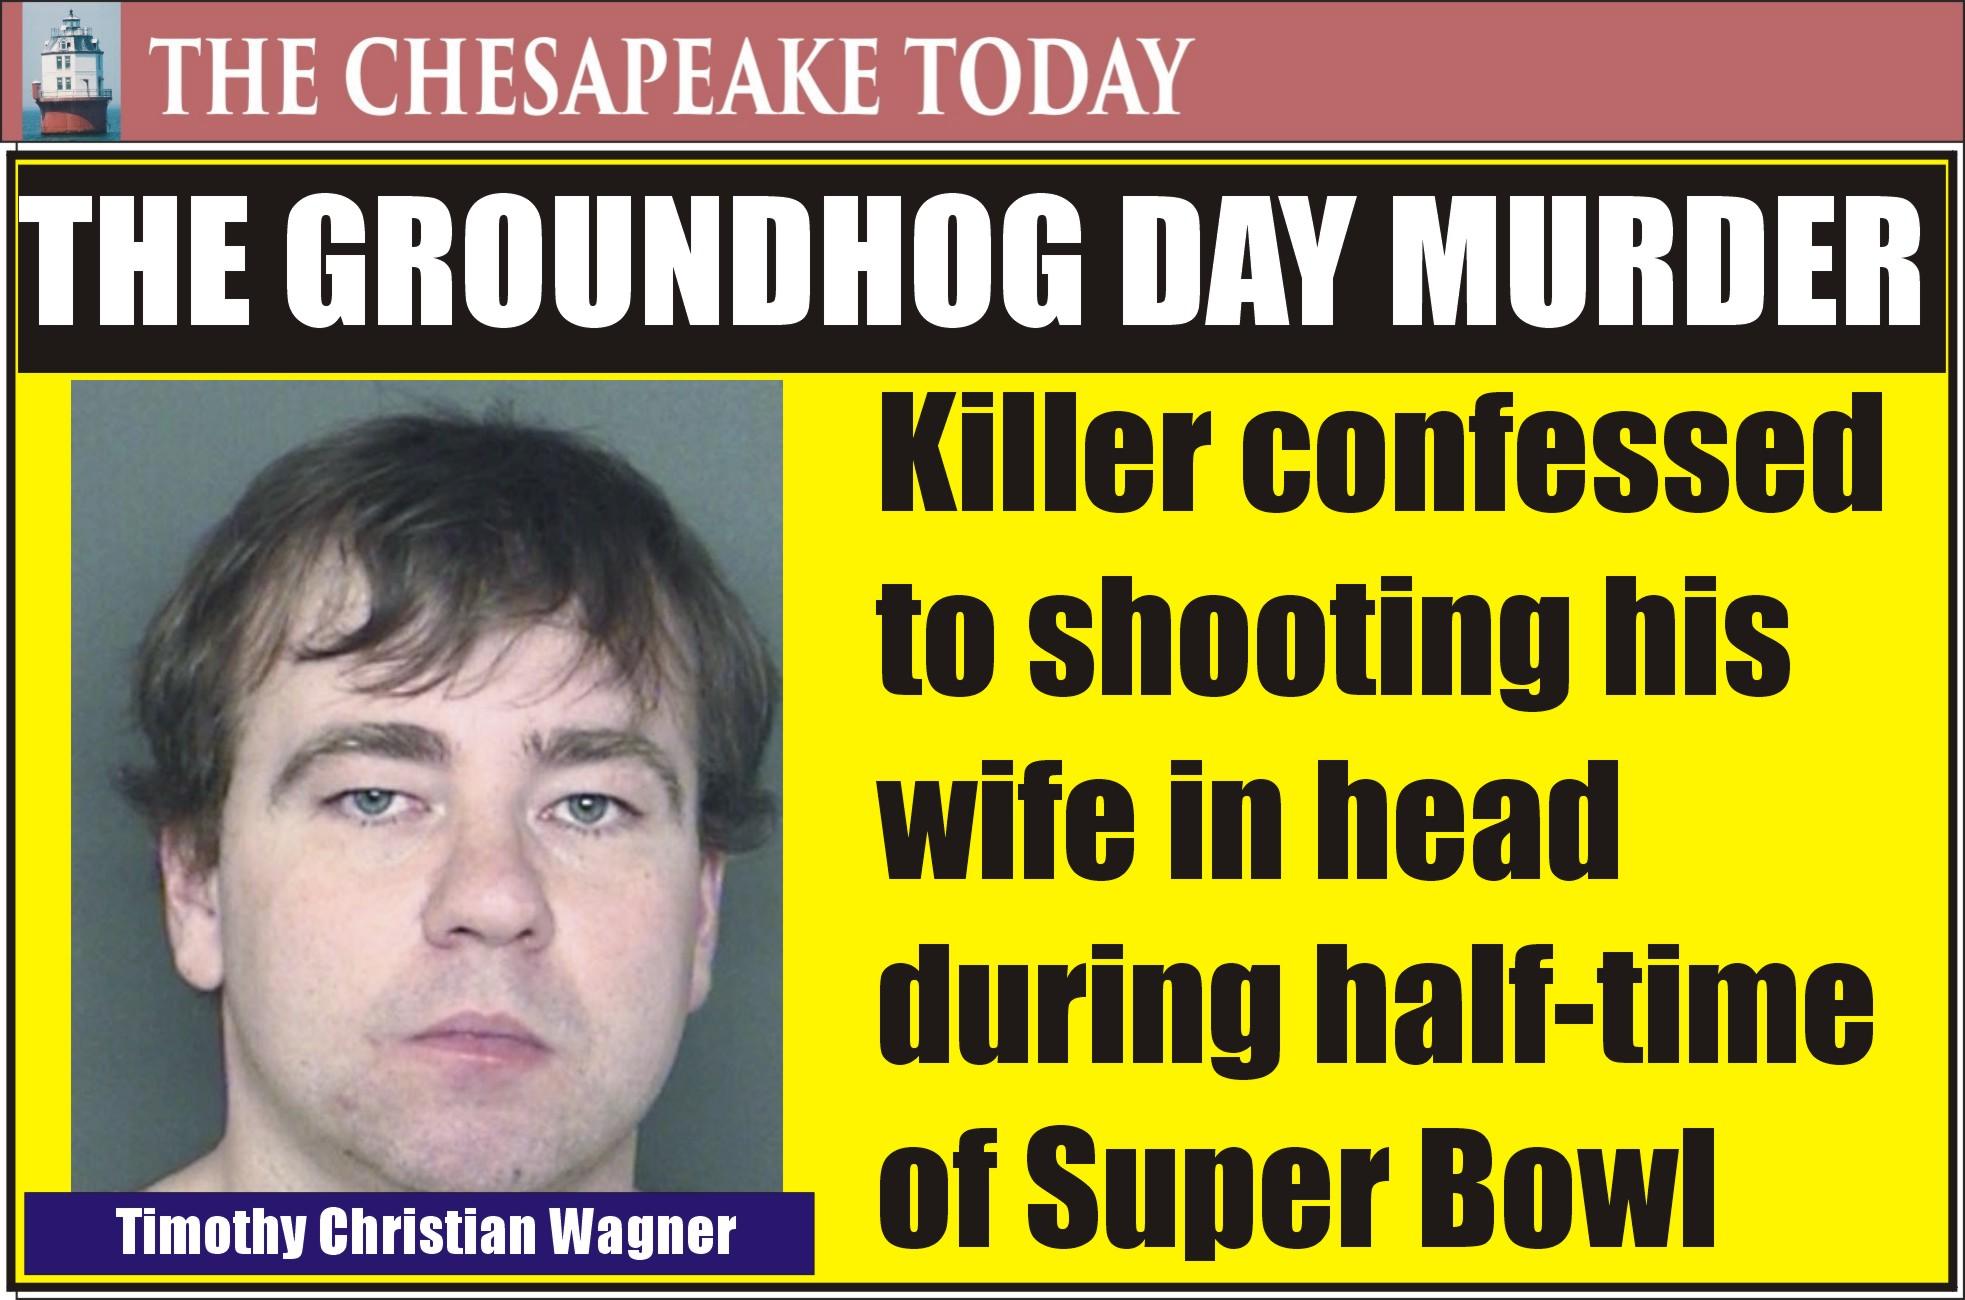 Timothy Christian School Nj Christmas Bazaar 2020 MURDER USA: The Groundhog Day Murder; Timothy Wagner called 911 to